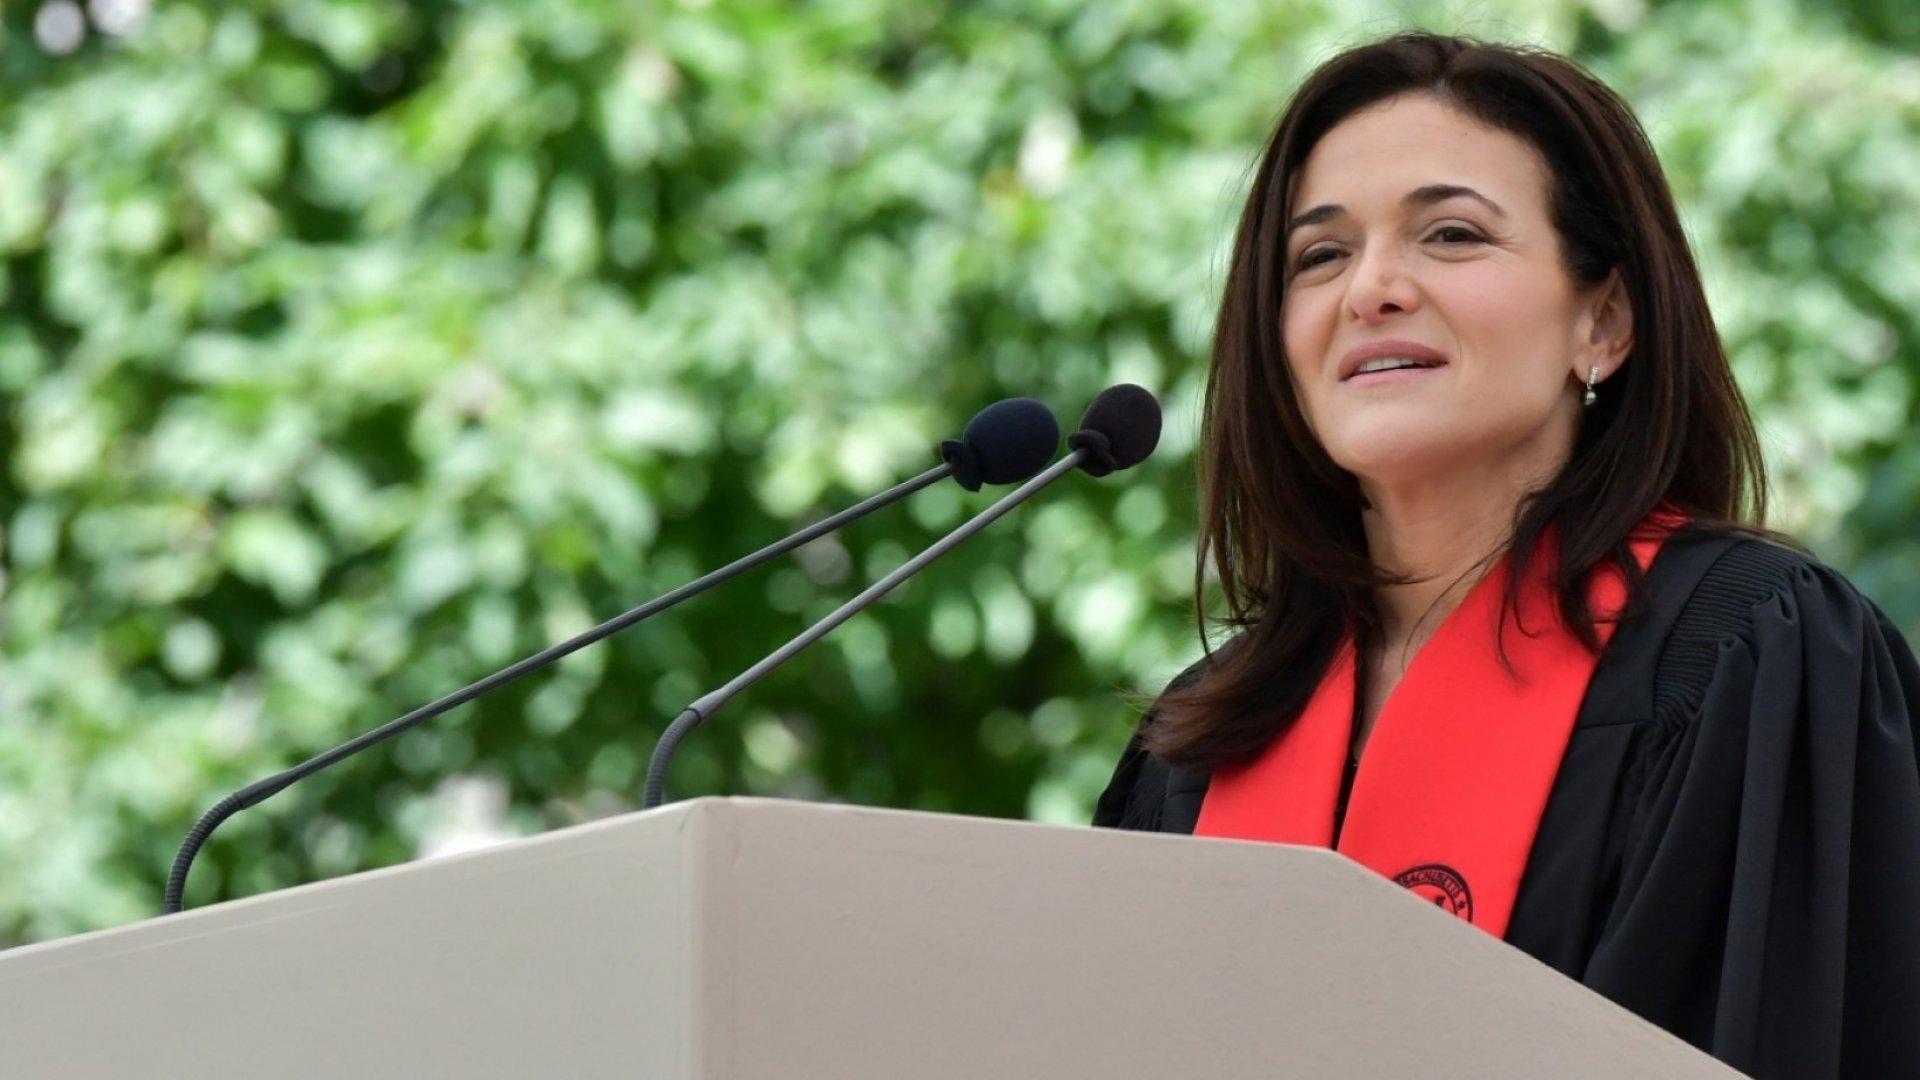 The World's Best Entrepreneurs Share 1 Key Personality Trait, Says Facebook's Sheryl Sandberg